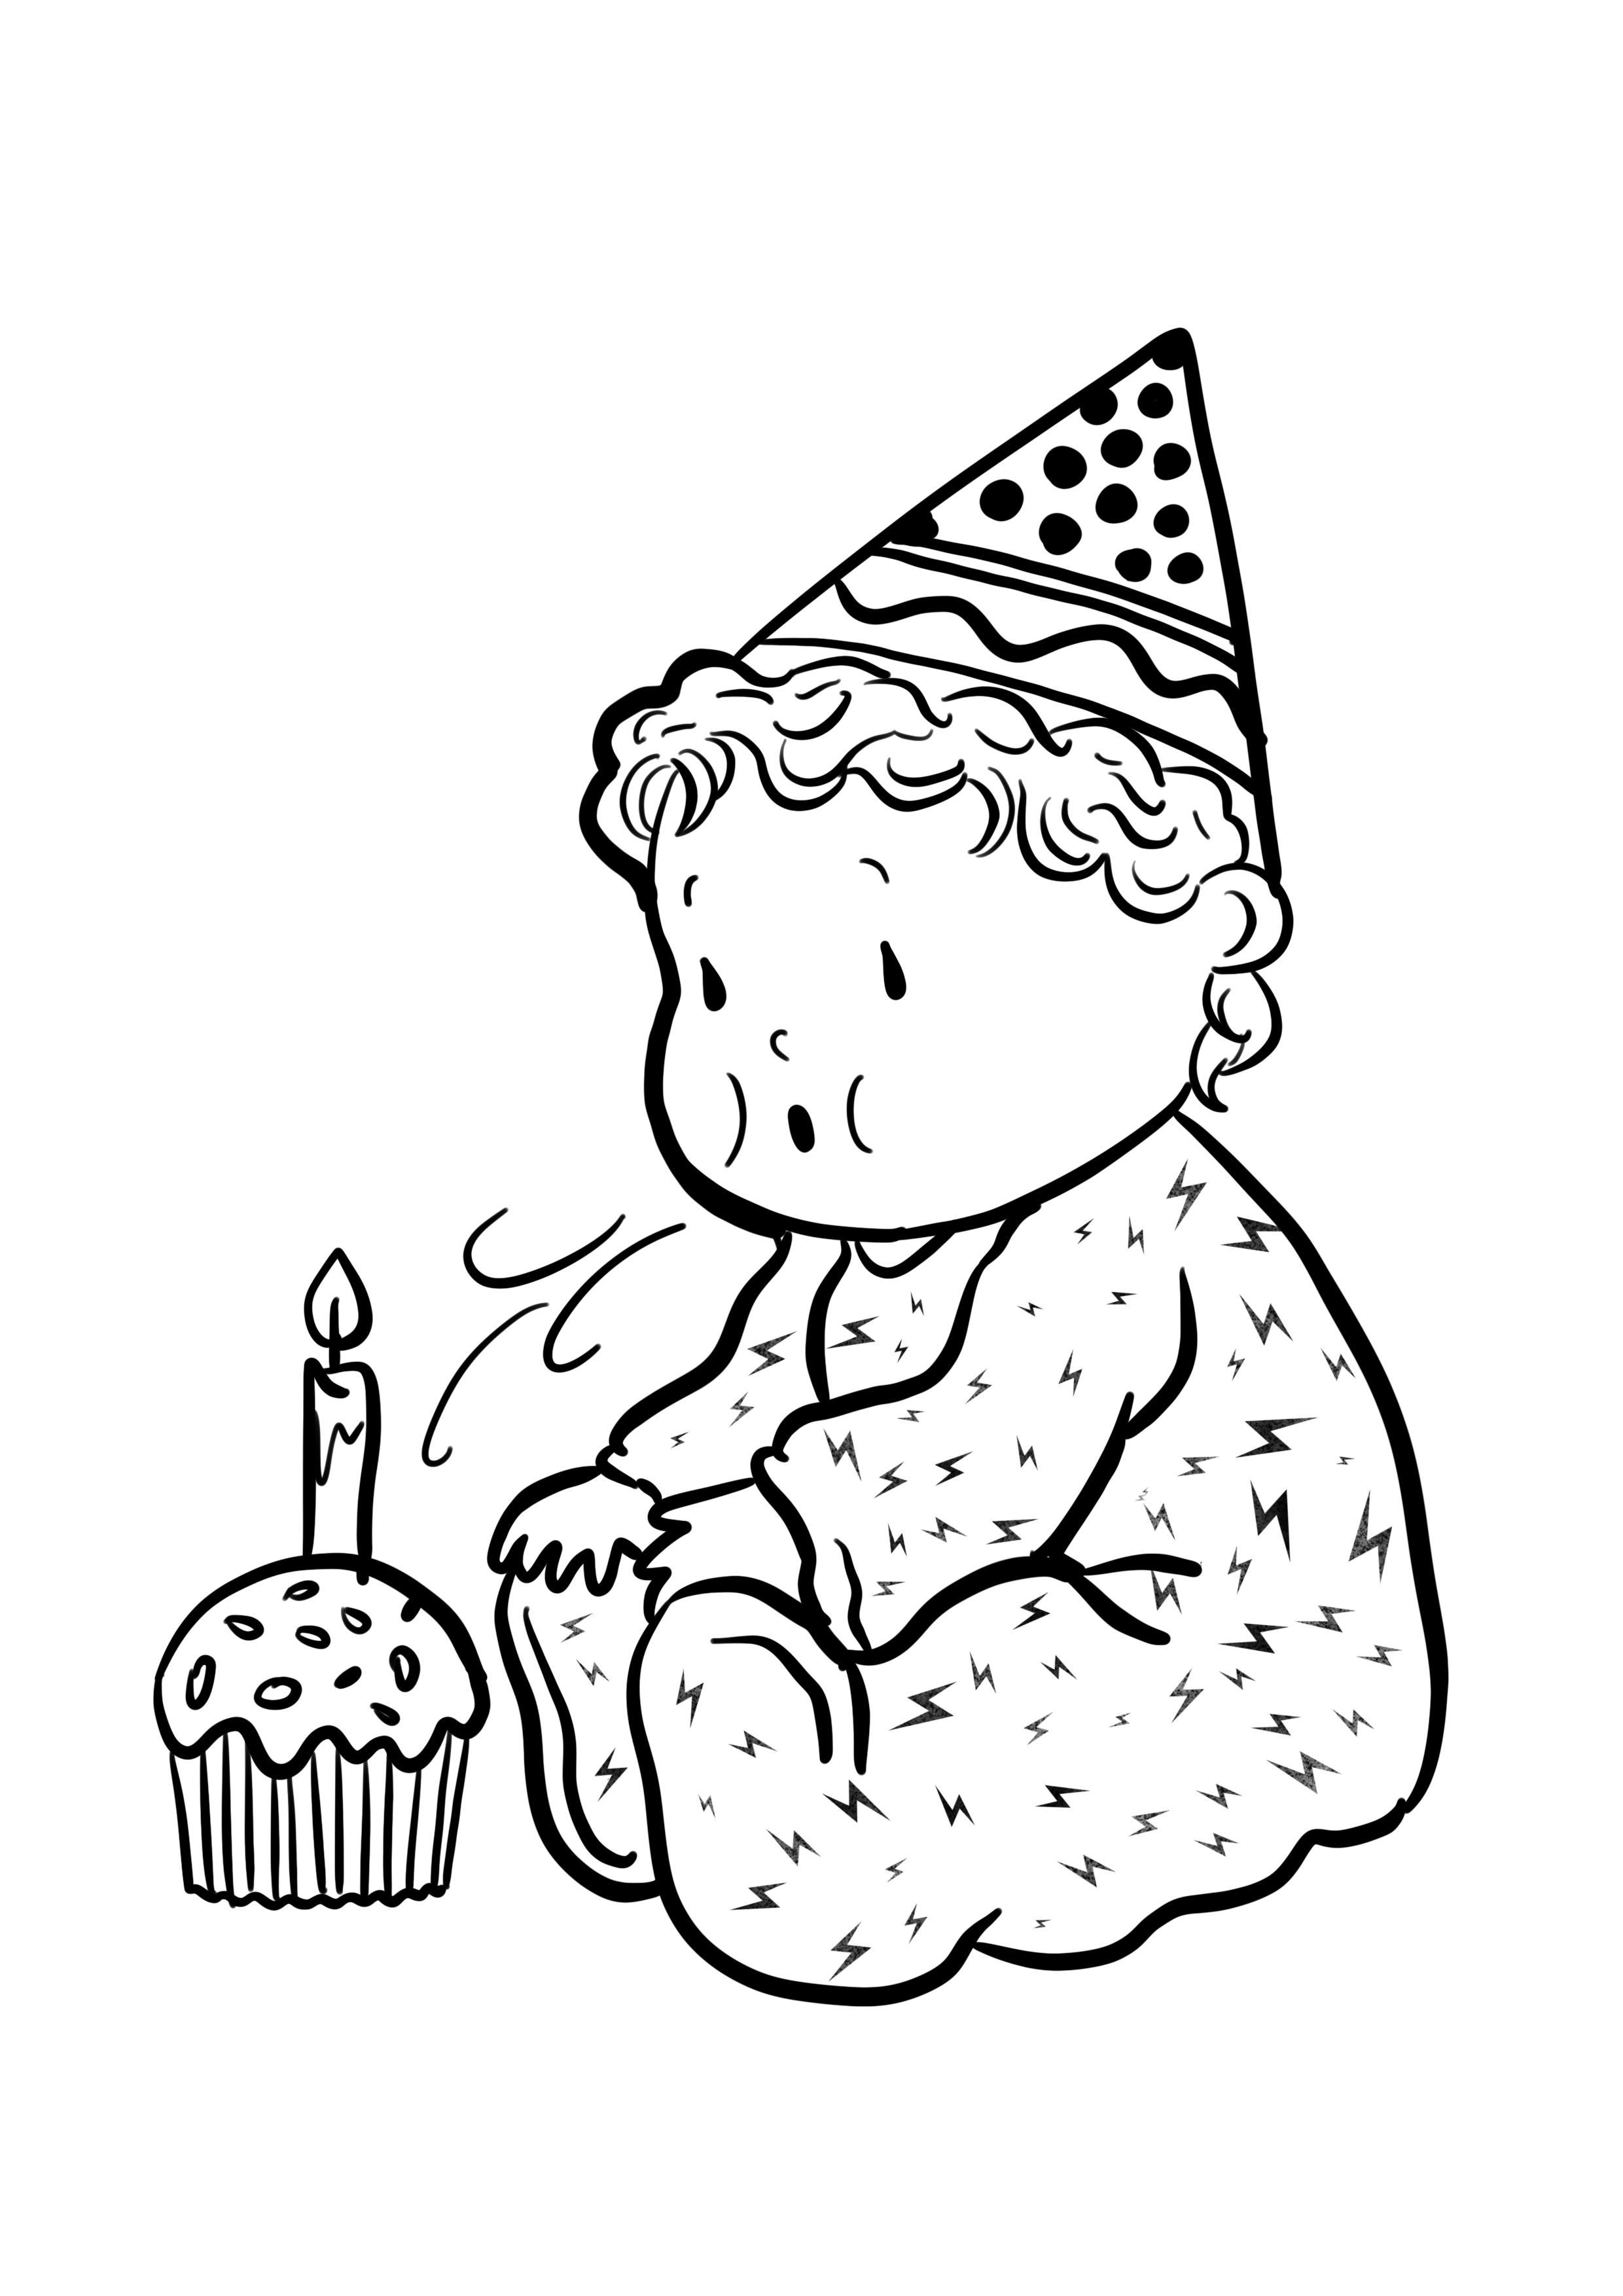 Disegni Di Compleanno Da Colorare Bebek Bebek